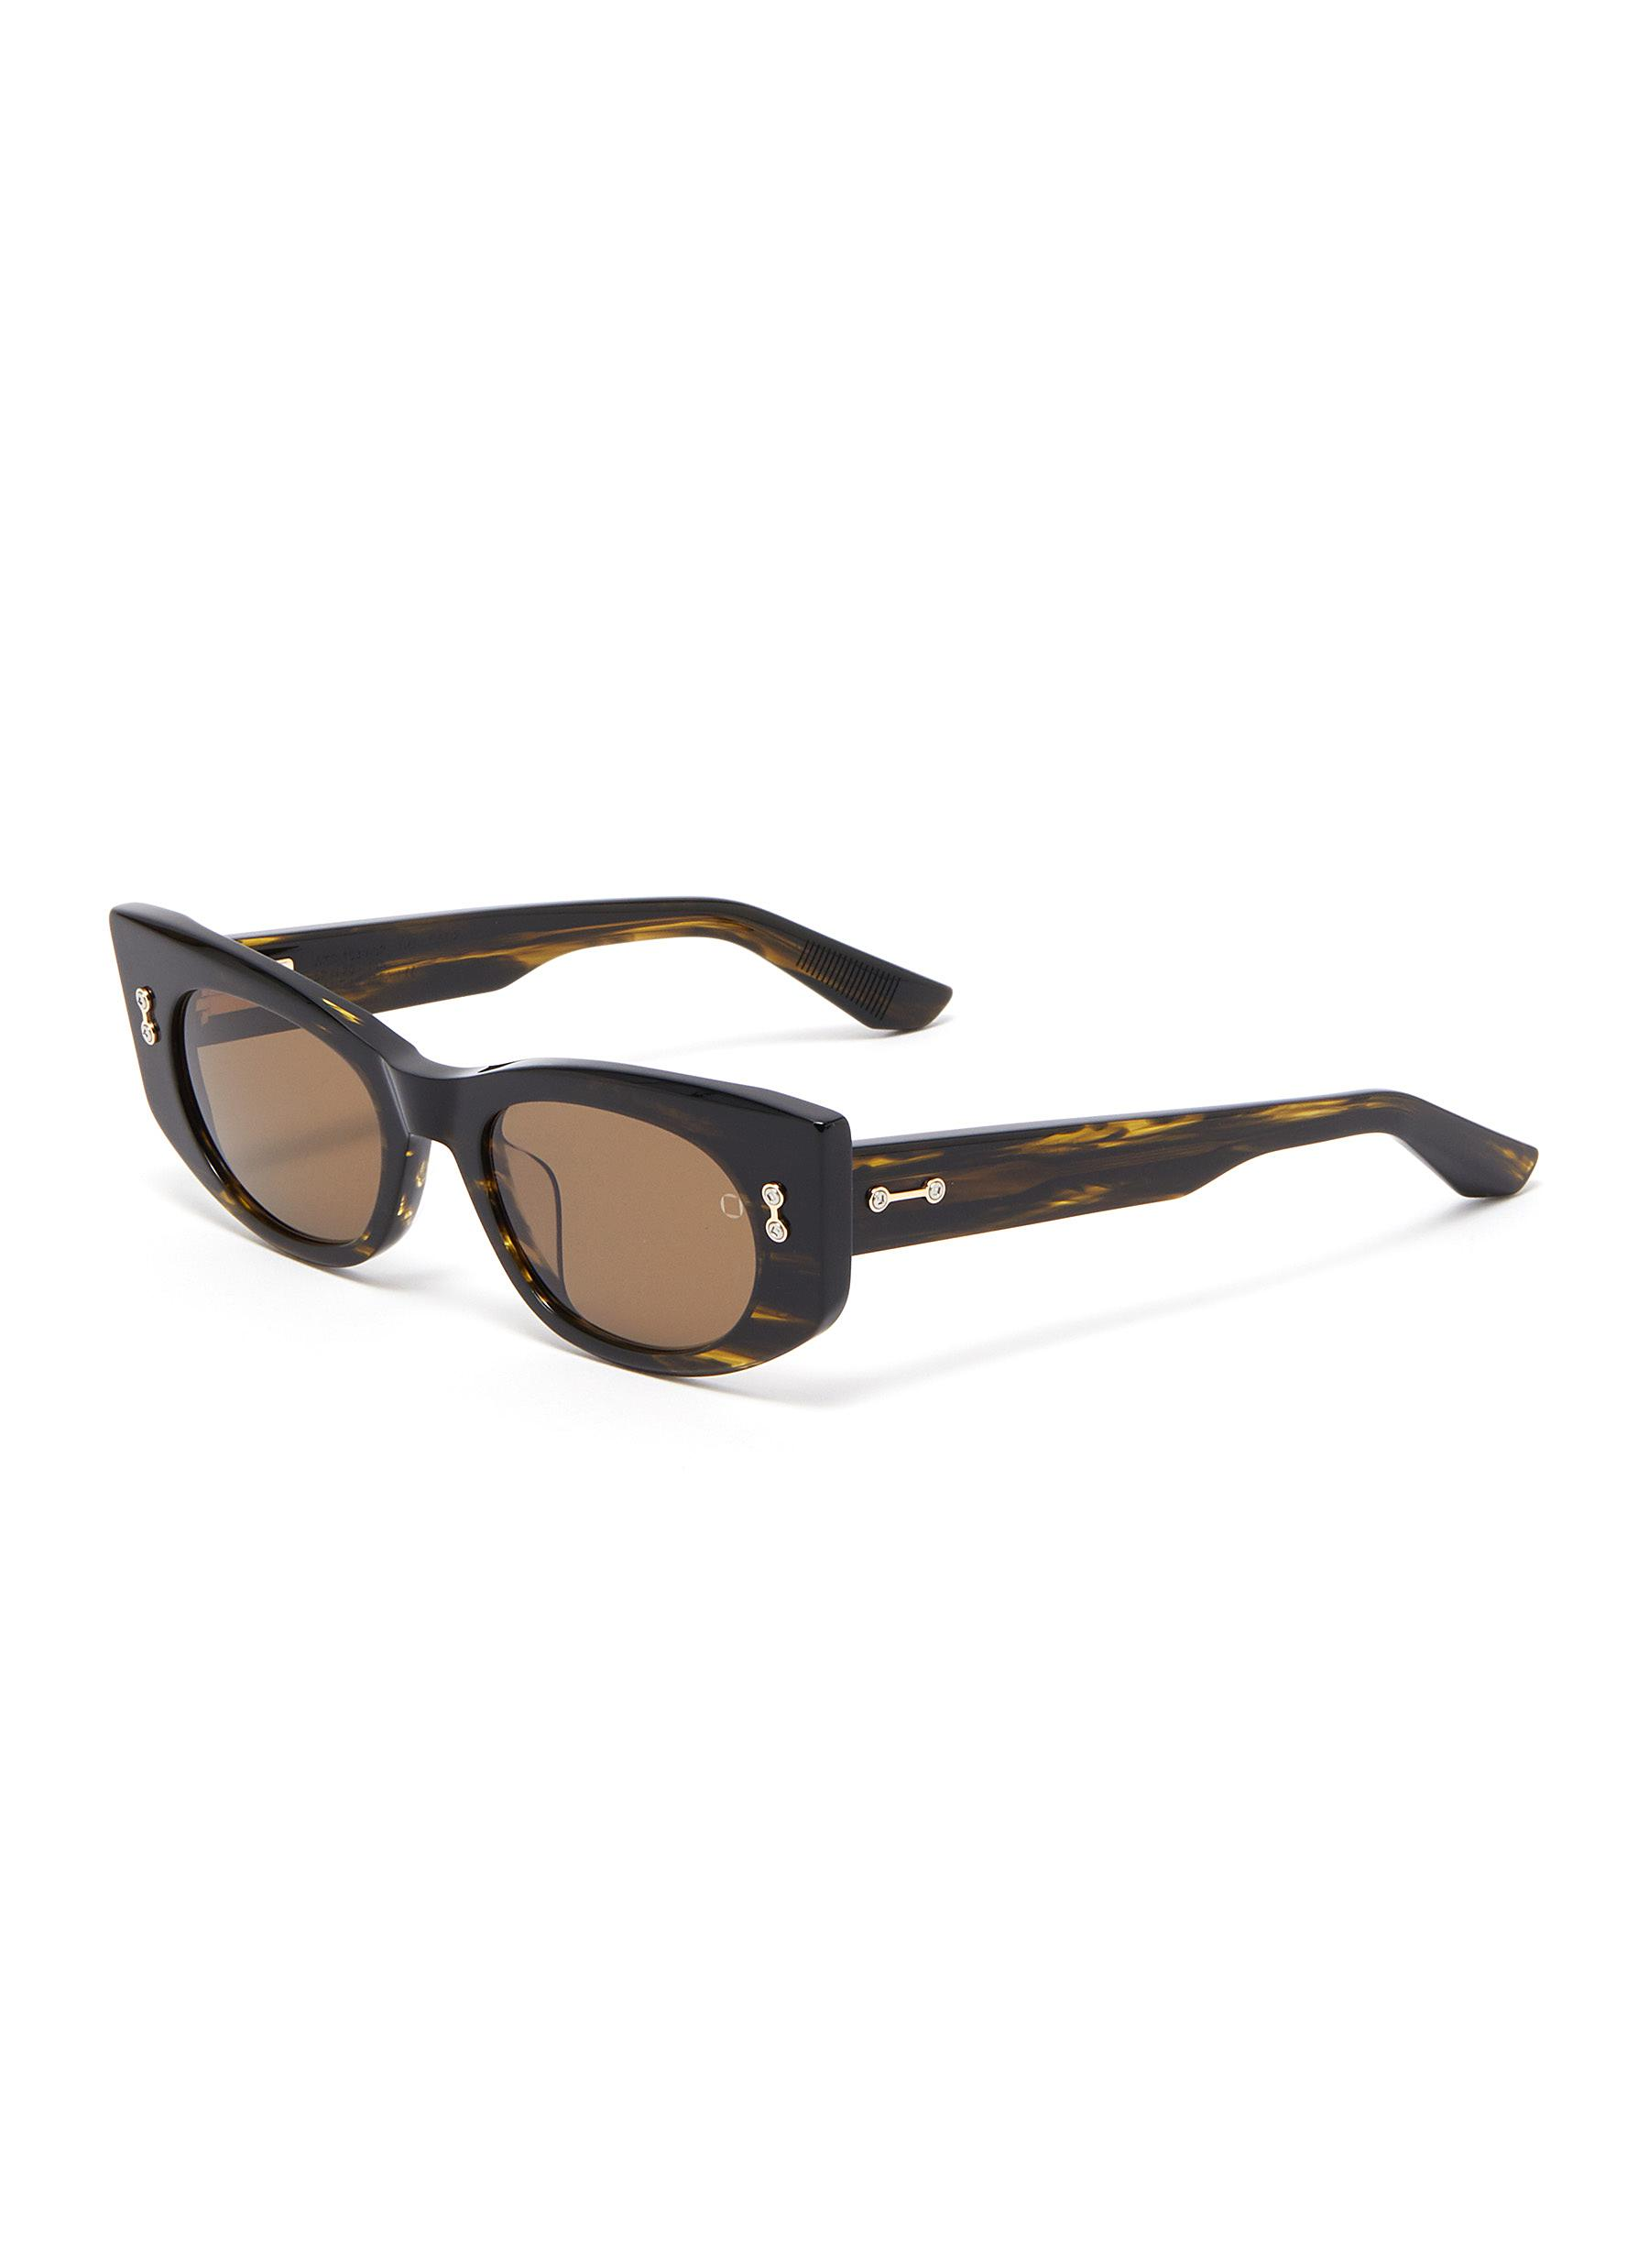 'Aquila' tortoiseshell effect acetate frame oval sunglasses